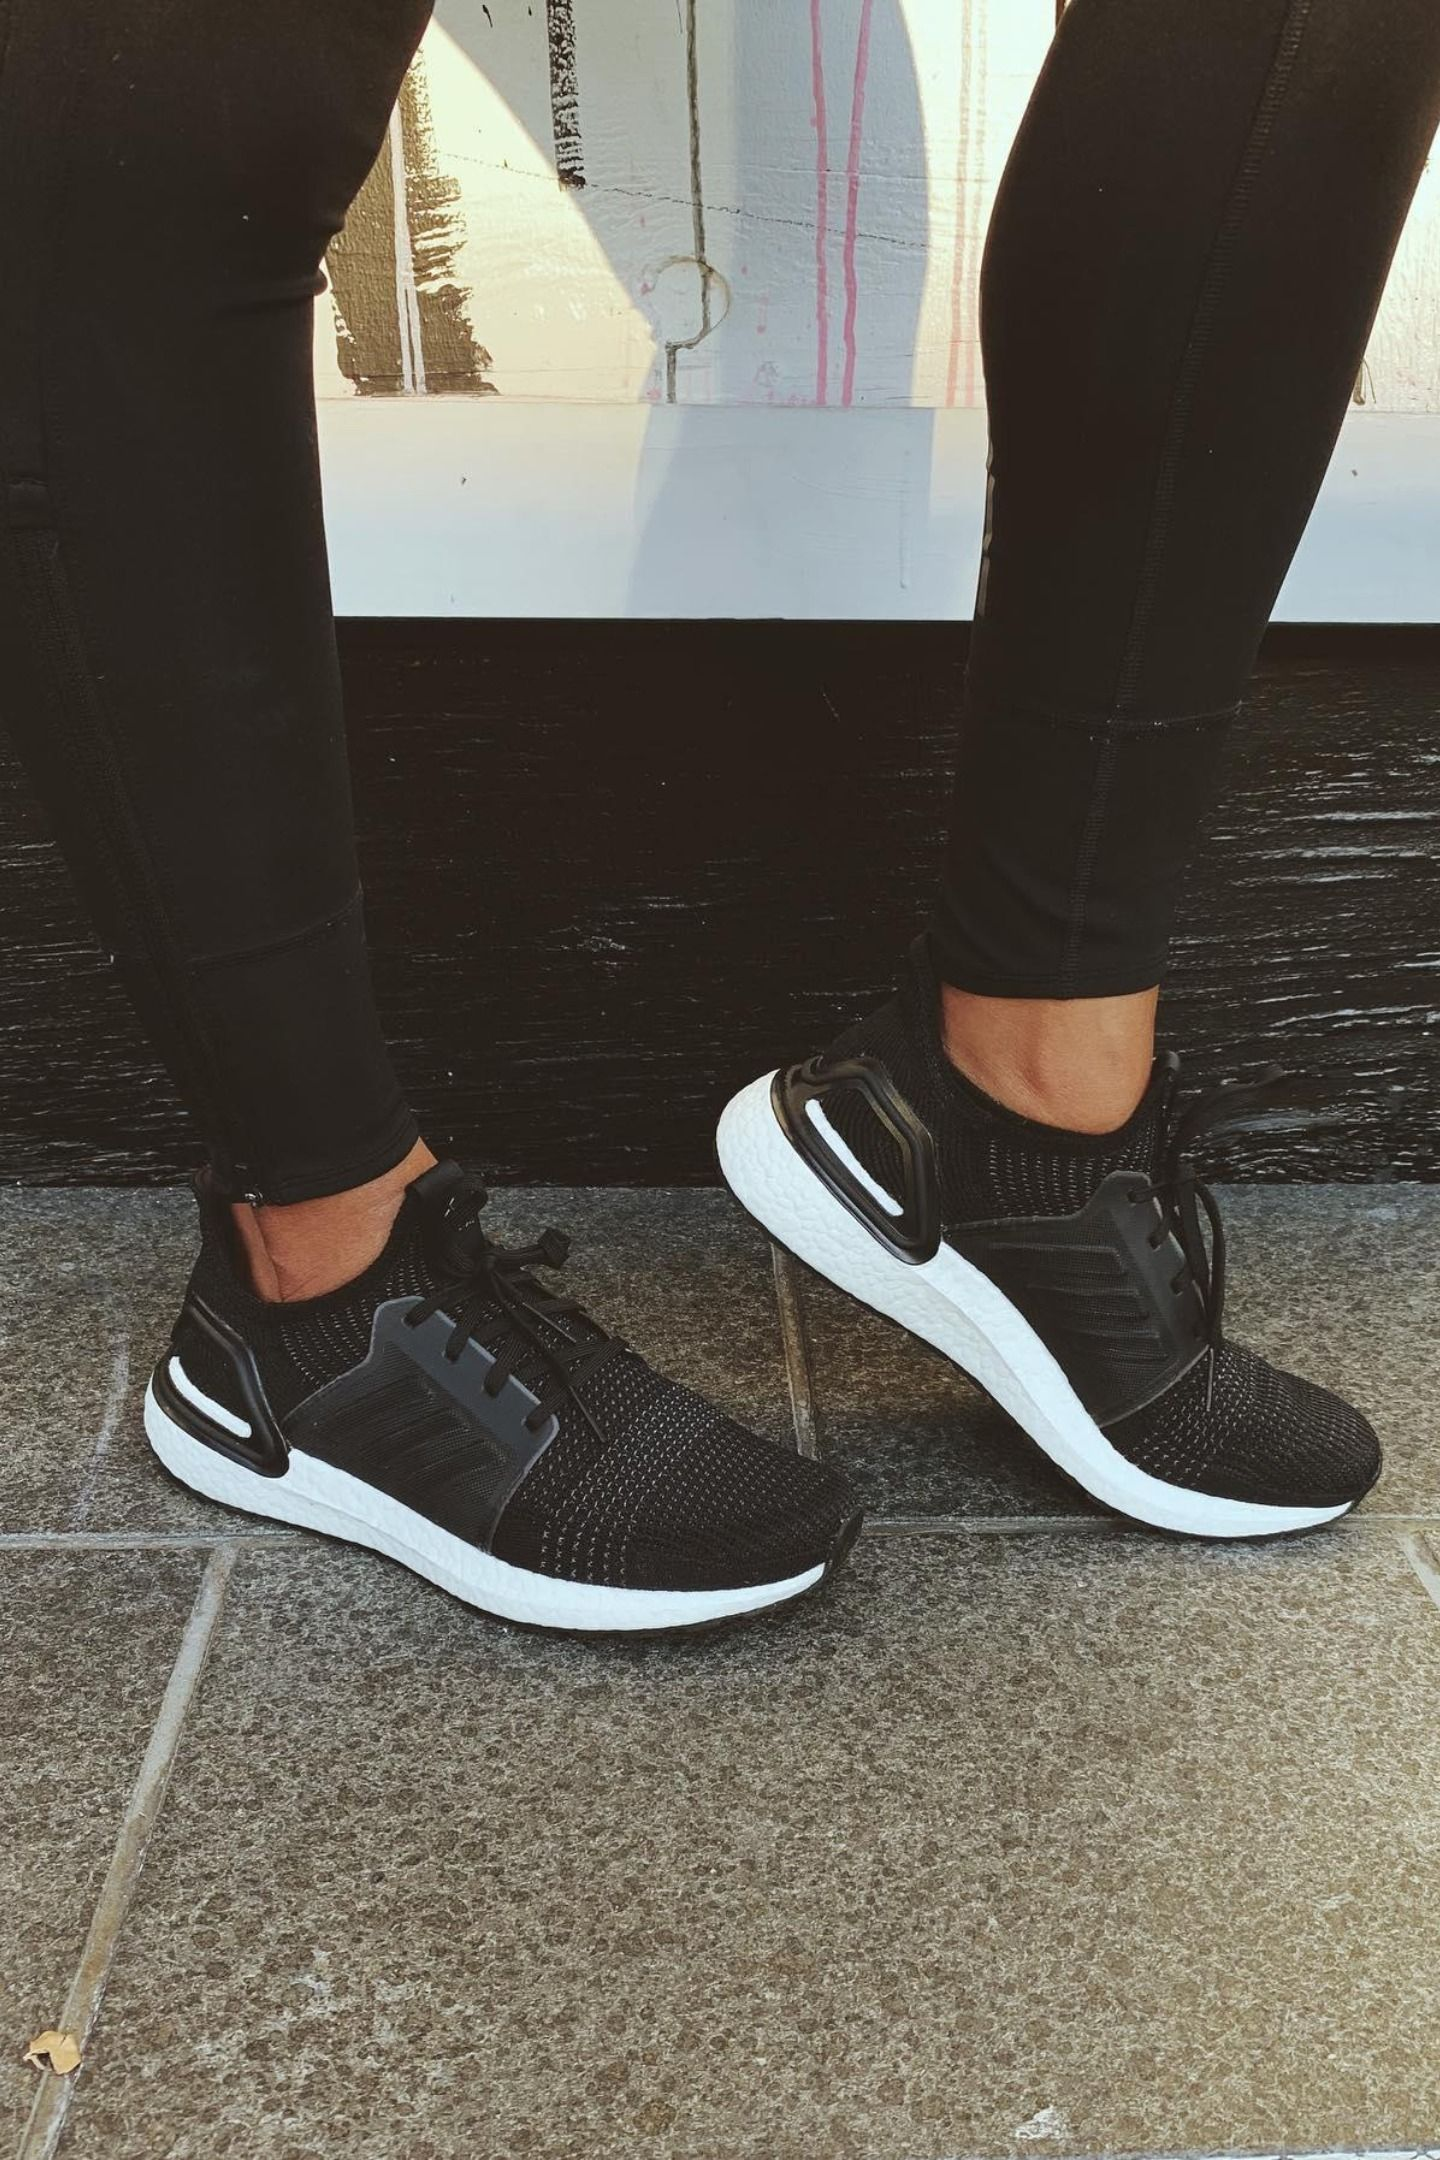 adidas Ultraboost 19 Shoes - Black